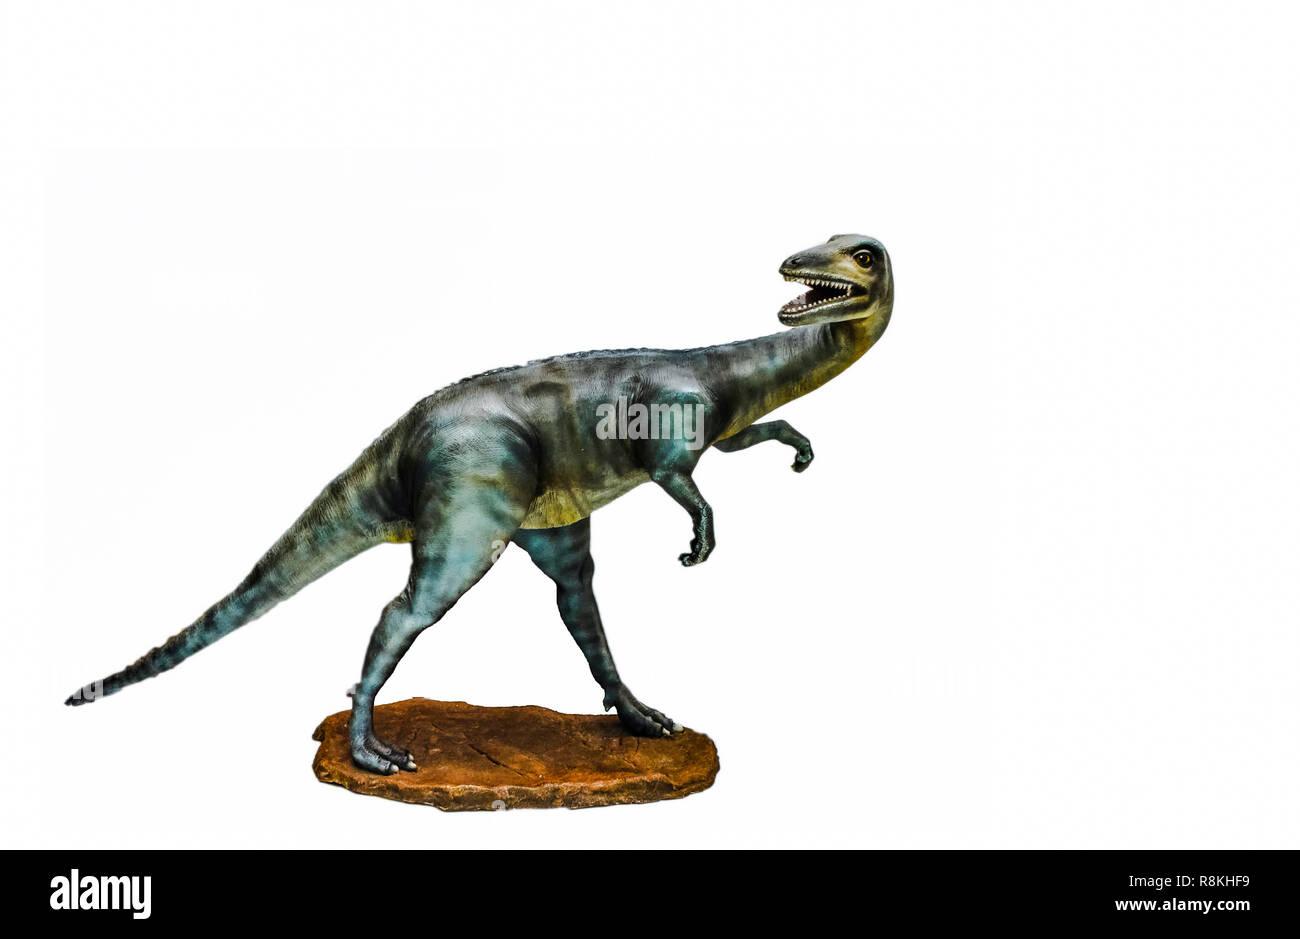 dinosaur isolated / dinosauria gallimimus statue isolated on white background - Stock Image